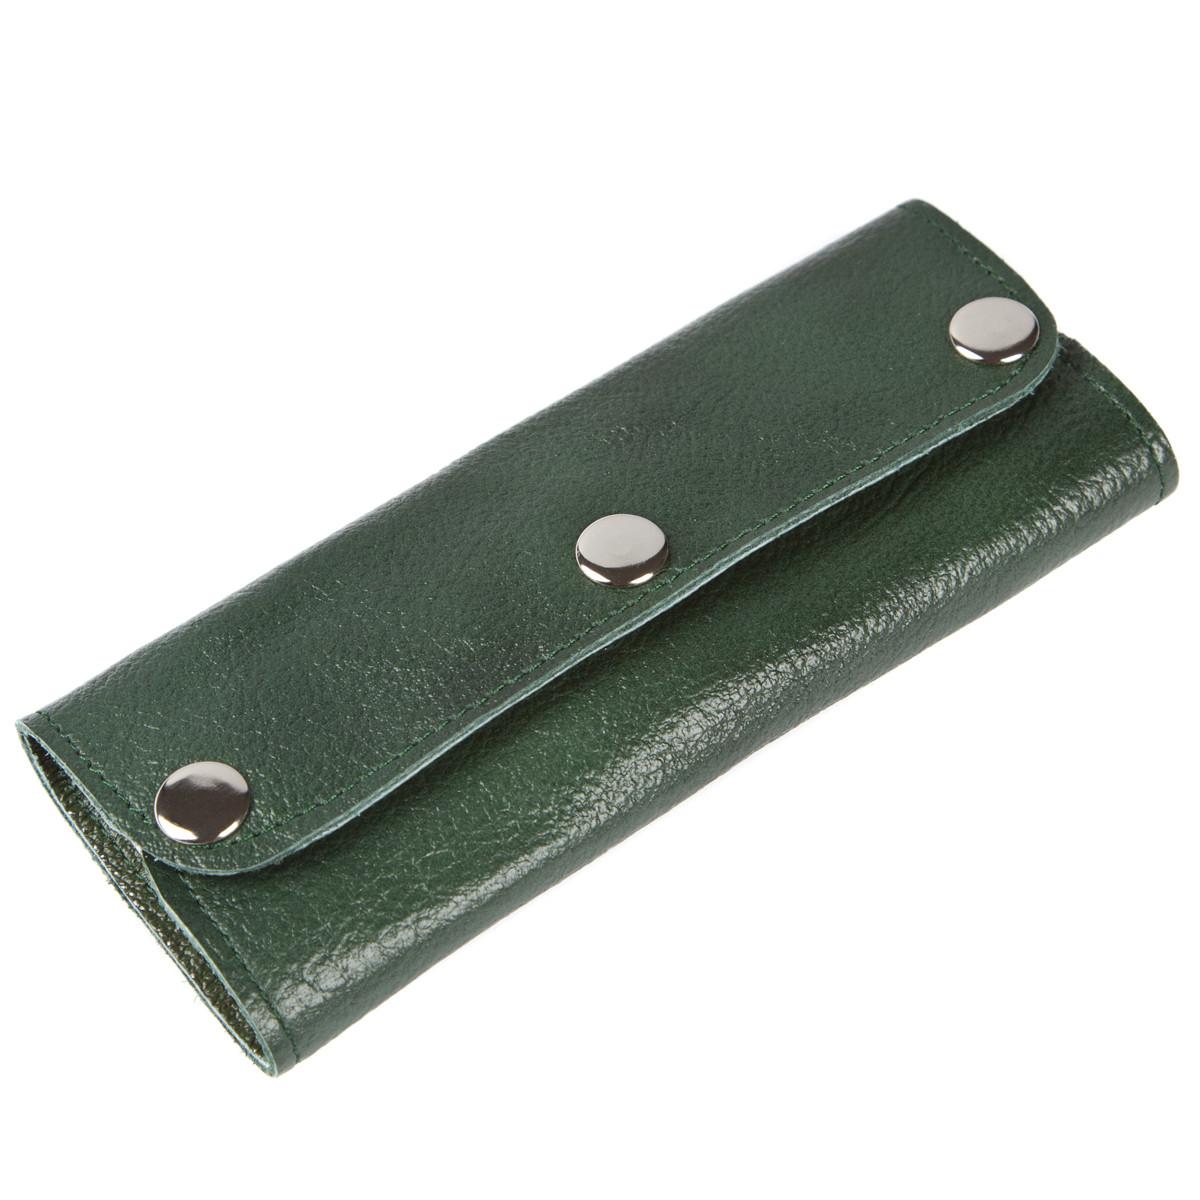 Ключница-портмоне на 6 ключей BagHouse кожаная 15х6,5х2,5    клКН15зел